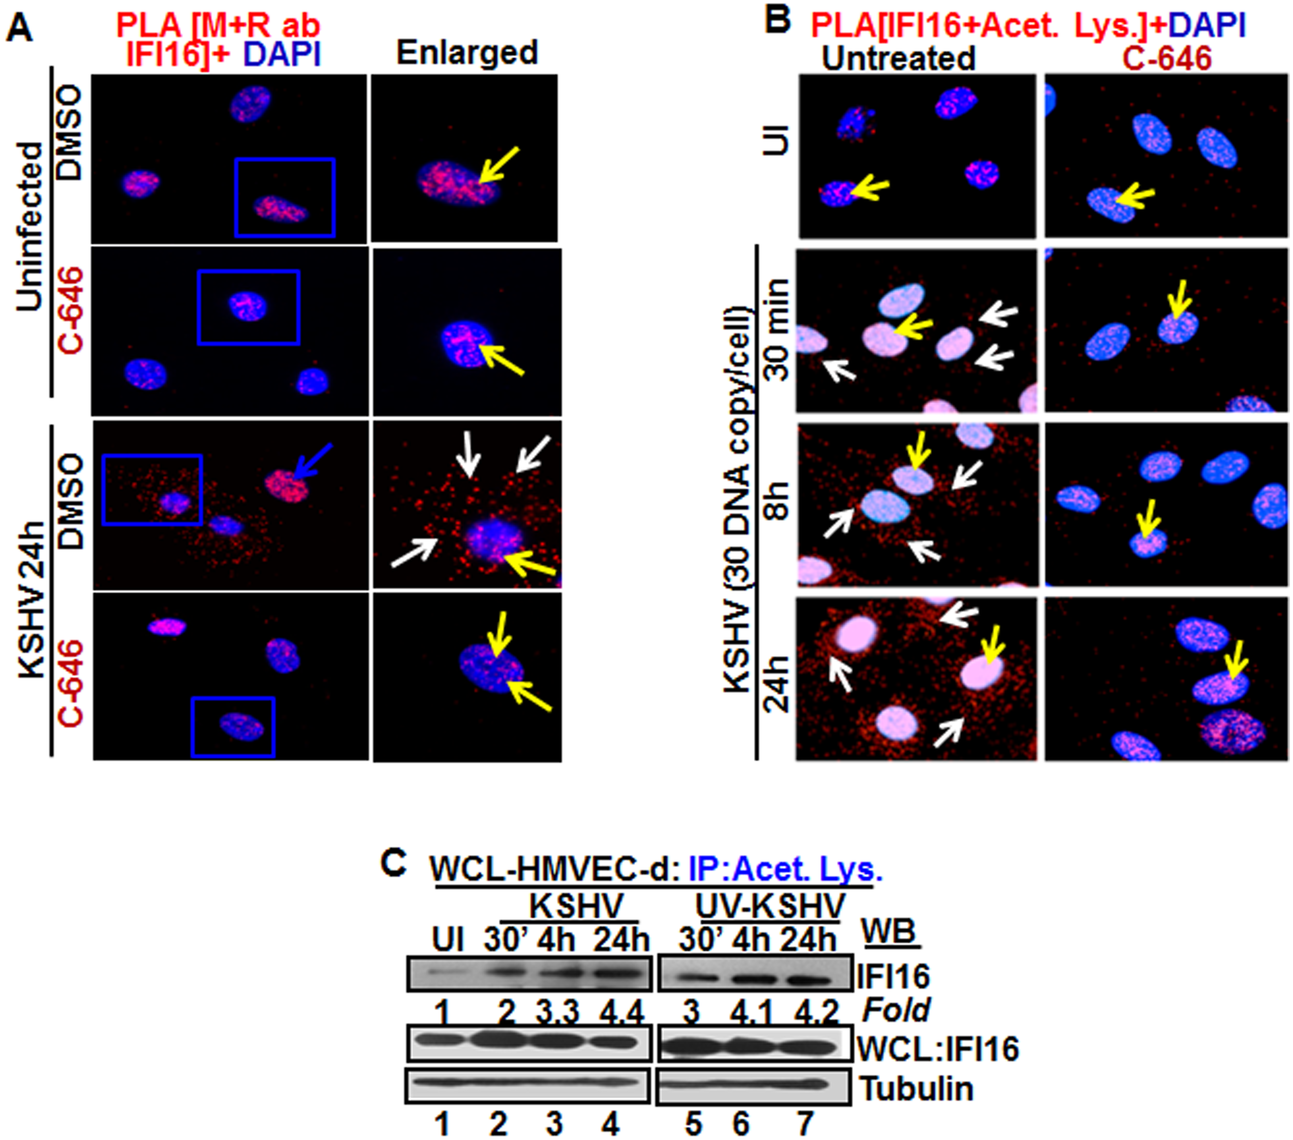 Proximity Ligation Assay (PLA) of IFI16's acetylation and cytoplasmic redistribution during <i>de novo</i> KSHV infection of HMVEC-d cells.